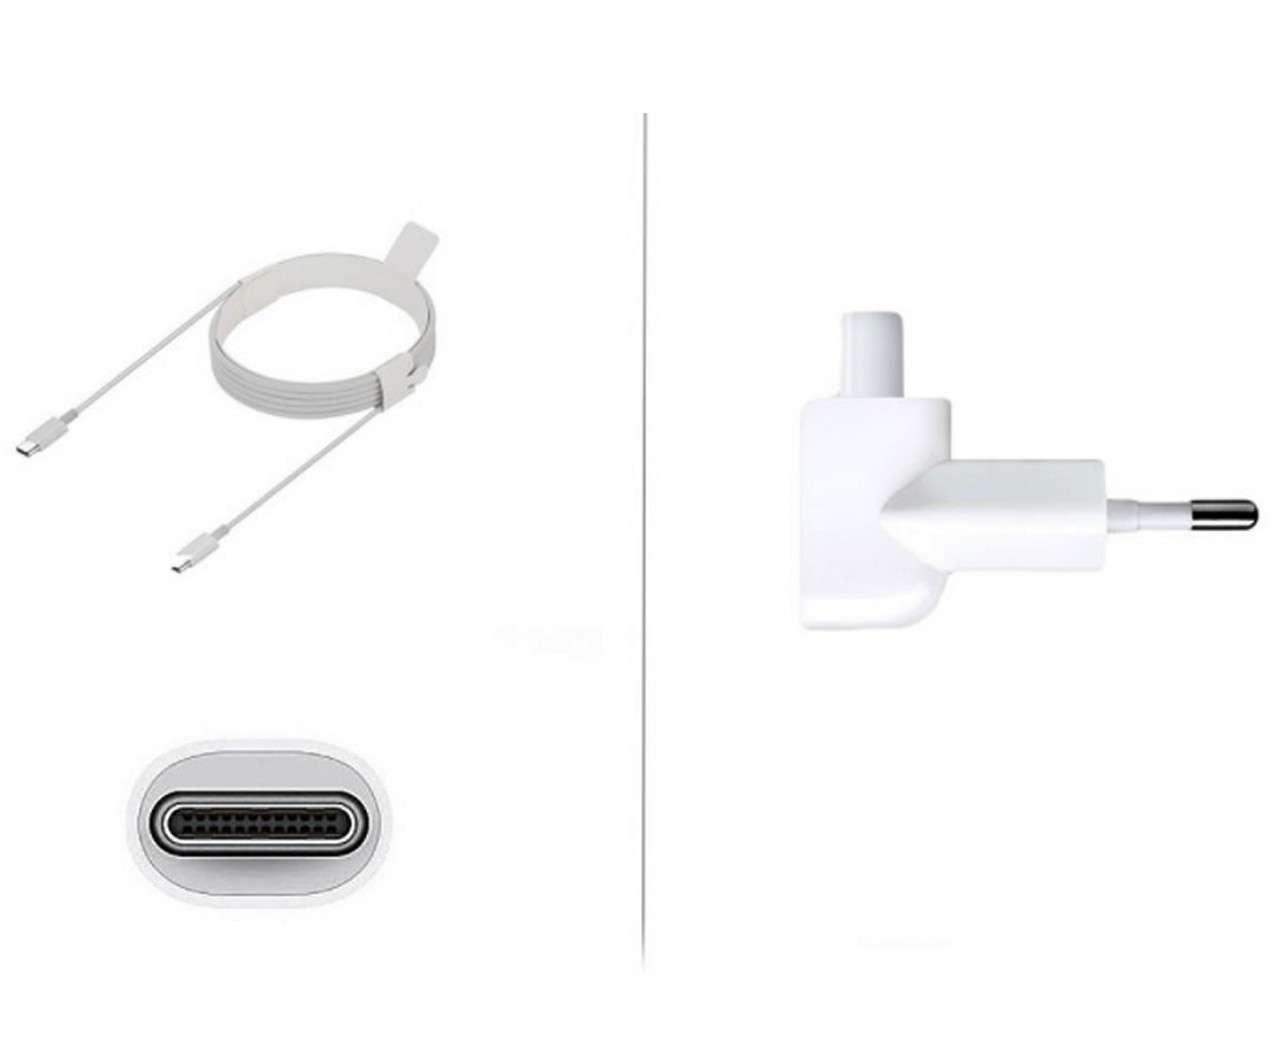 Incarcator Apple A1534 imagine powerlaptop.ro 2021